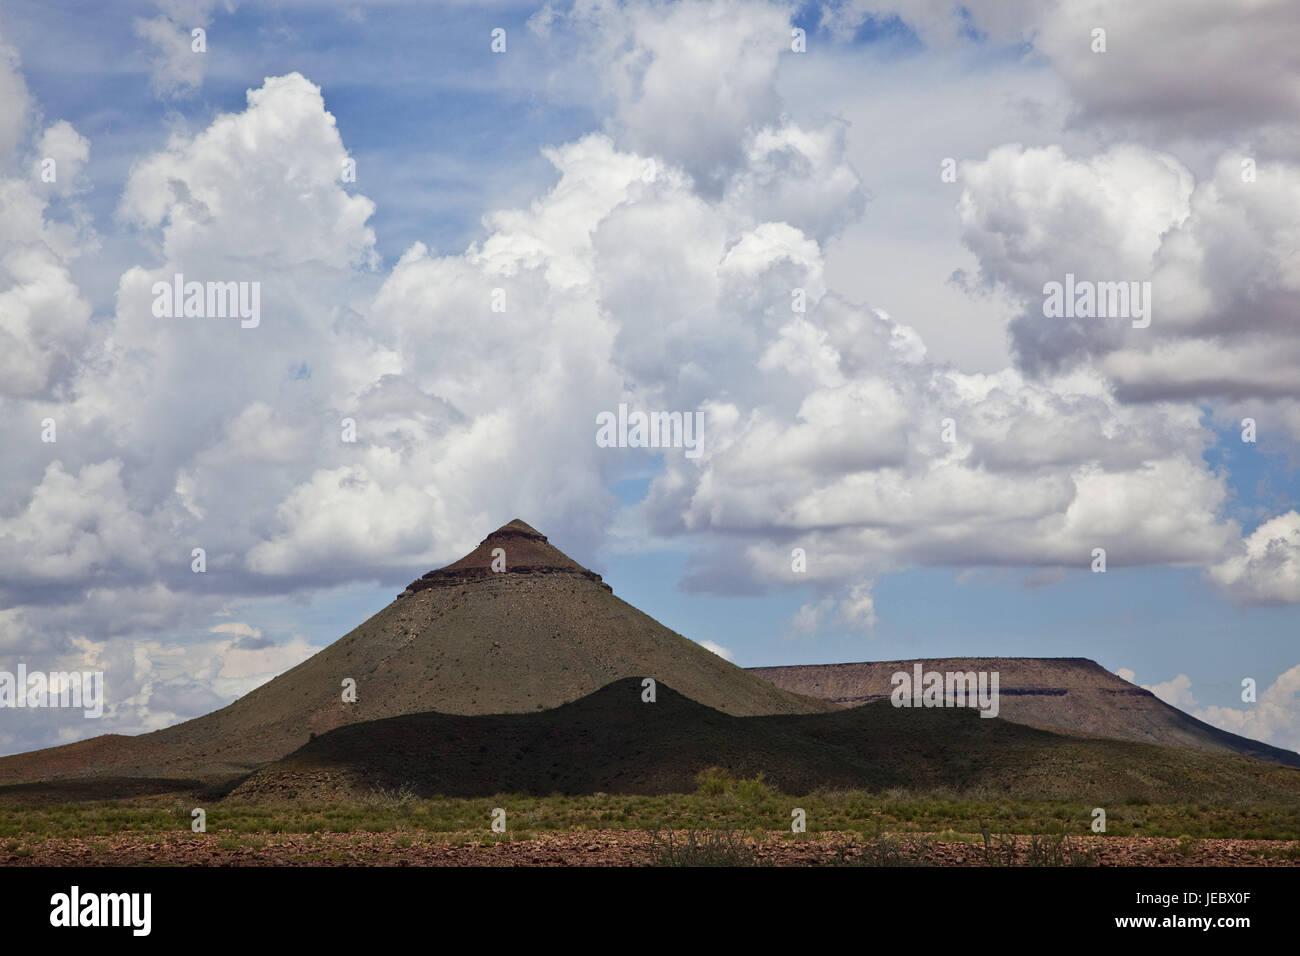 Africa, Namibia, Kunene region, Damara country, skeleton coasts park, mountain, margin, skeleton coast park, mountain - Stock Image